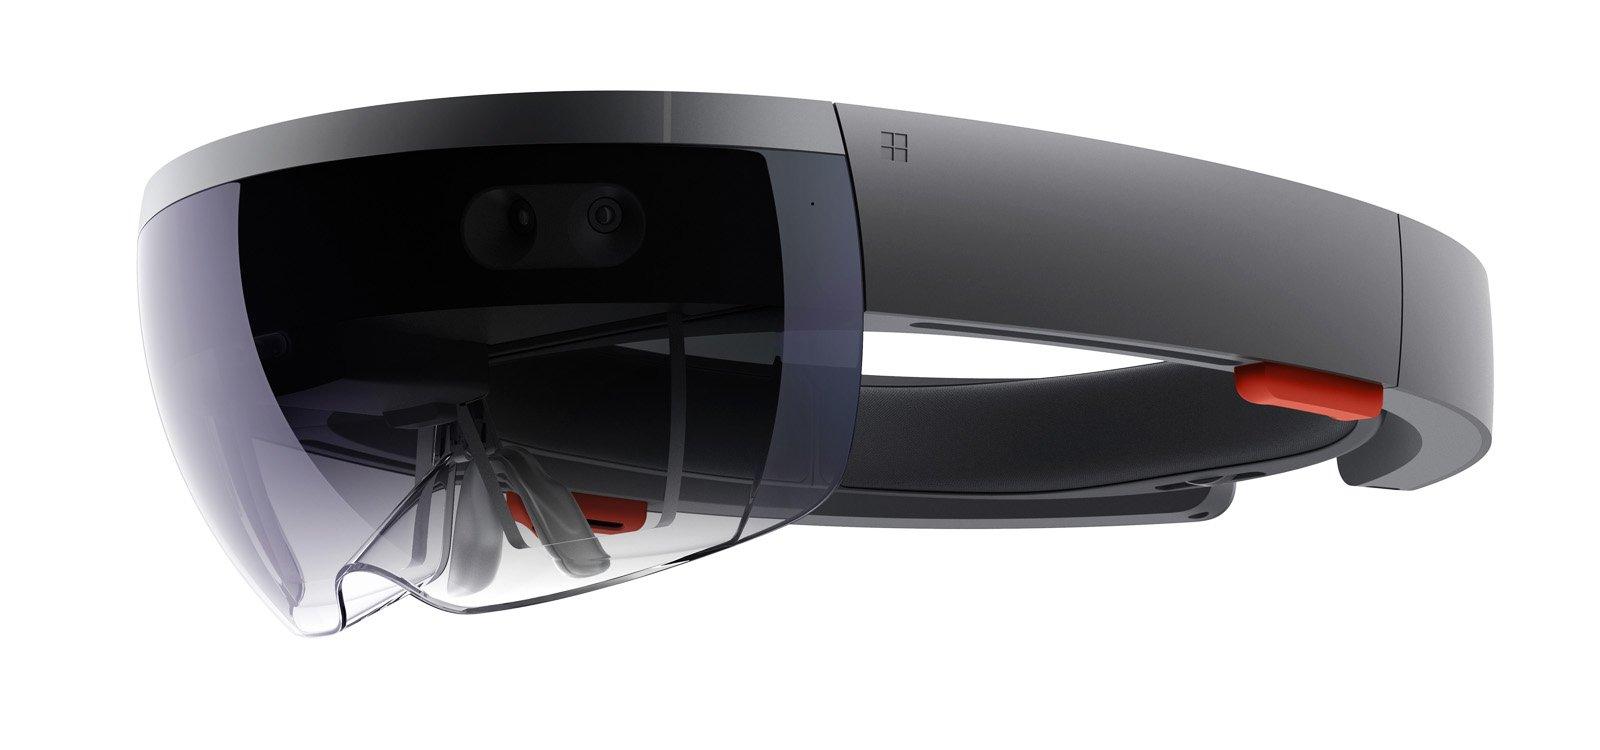 <p>微软已推出混合现实头显设备HoloLens。</p>